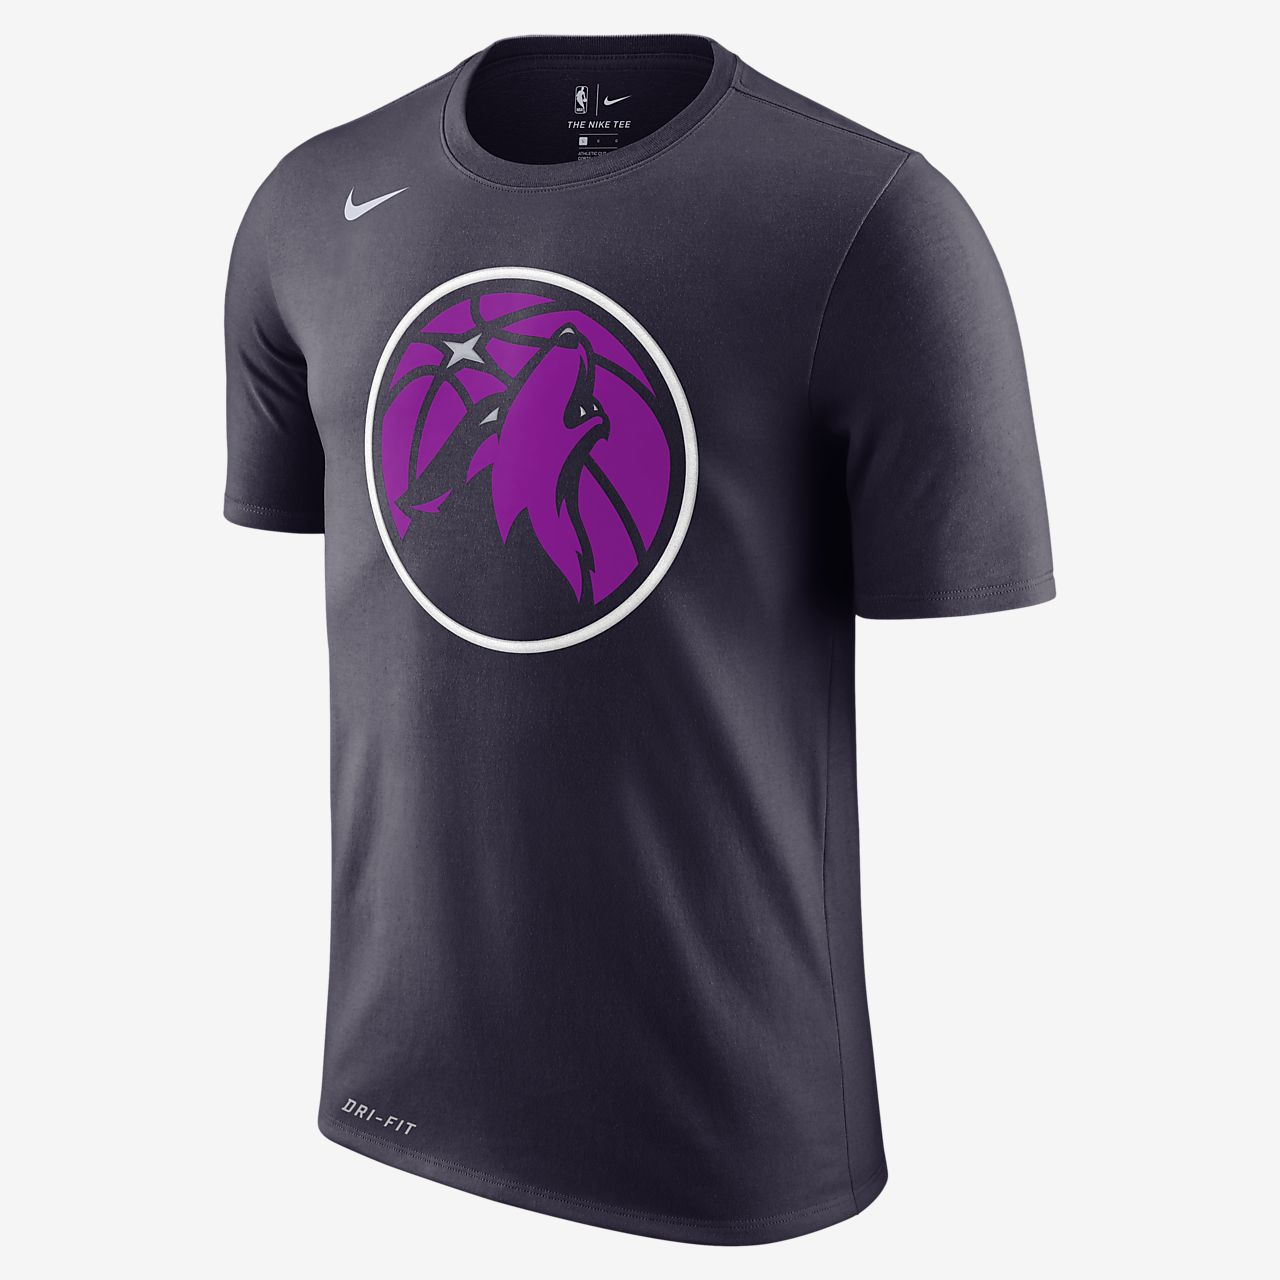 dacfcbf6c5c ... Minnesota Timberwolves City Edition Nike Dri-FIT Men's NBA T-Shirt